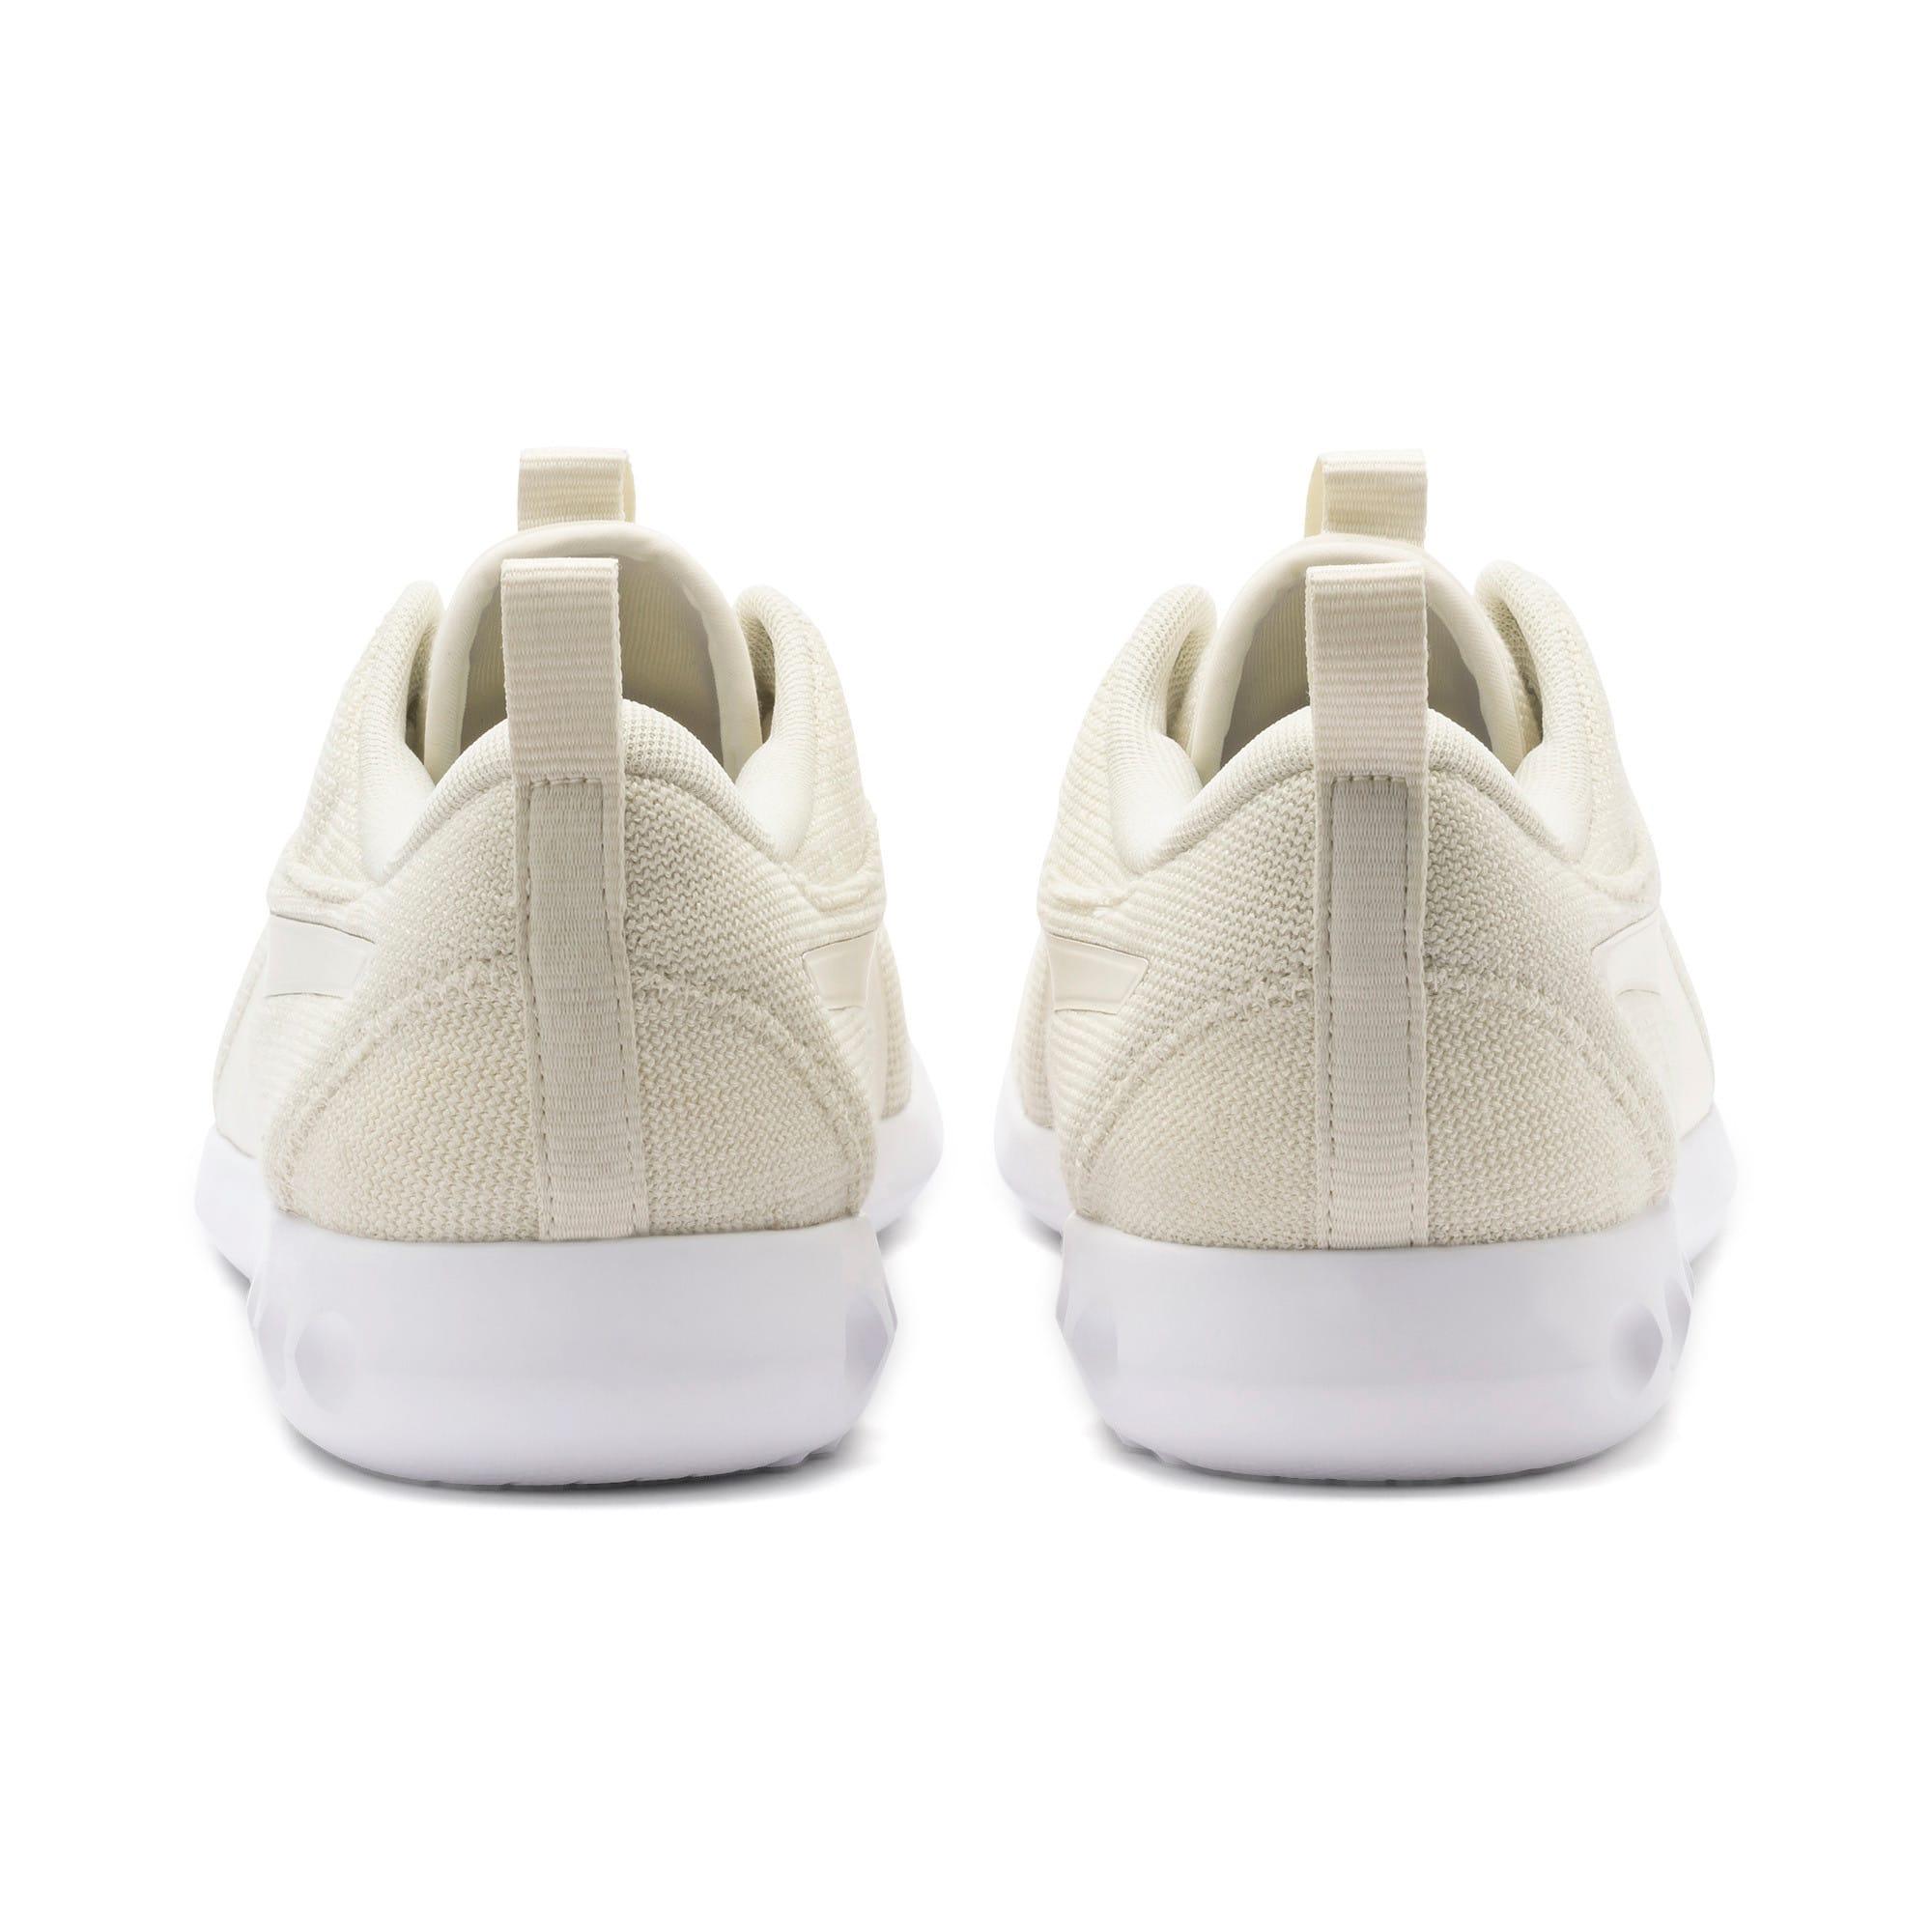 Thumbnail 3 of Carson 2 Knit Men's Training Shoes, White-Whisper White-Gold, medium